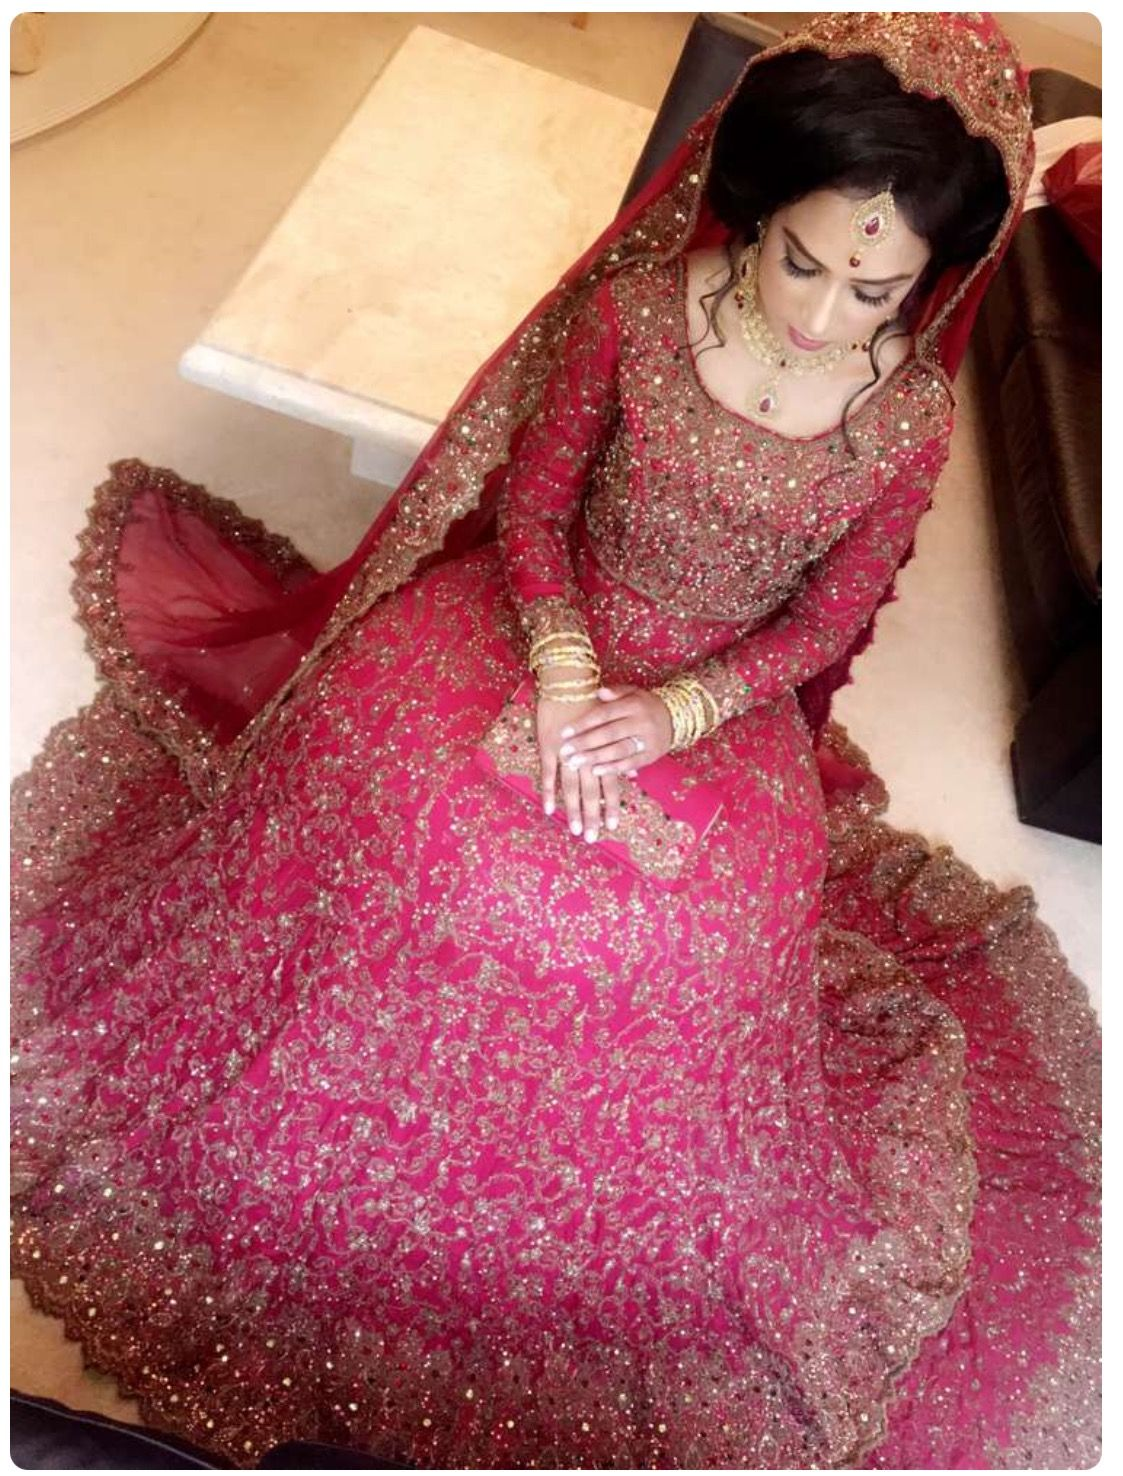 Pin de Shehrin P. en bridal looooks | Pinterest | Rabia, Ranas y ...